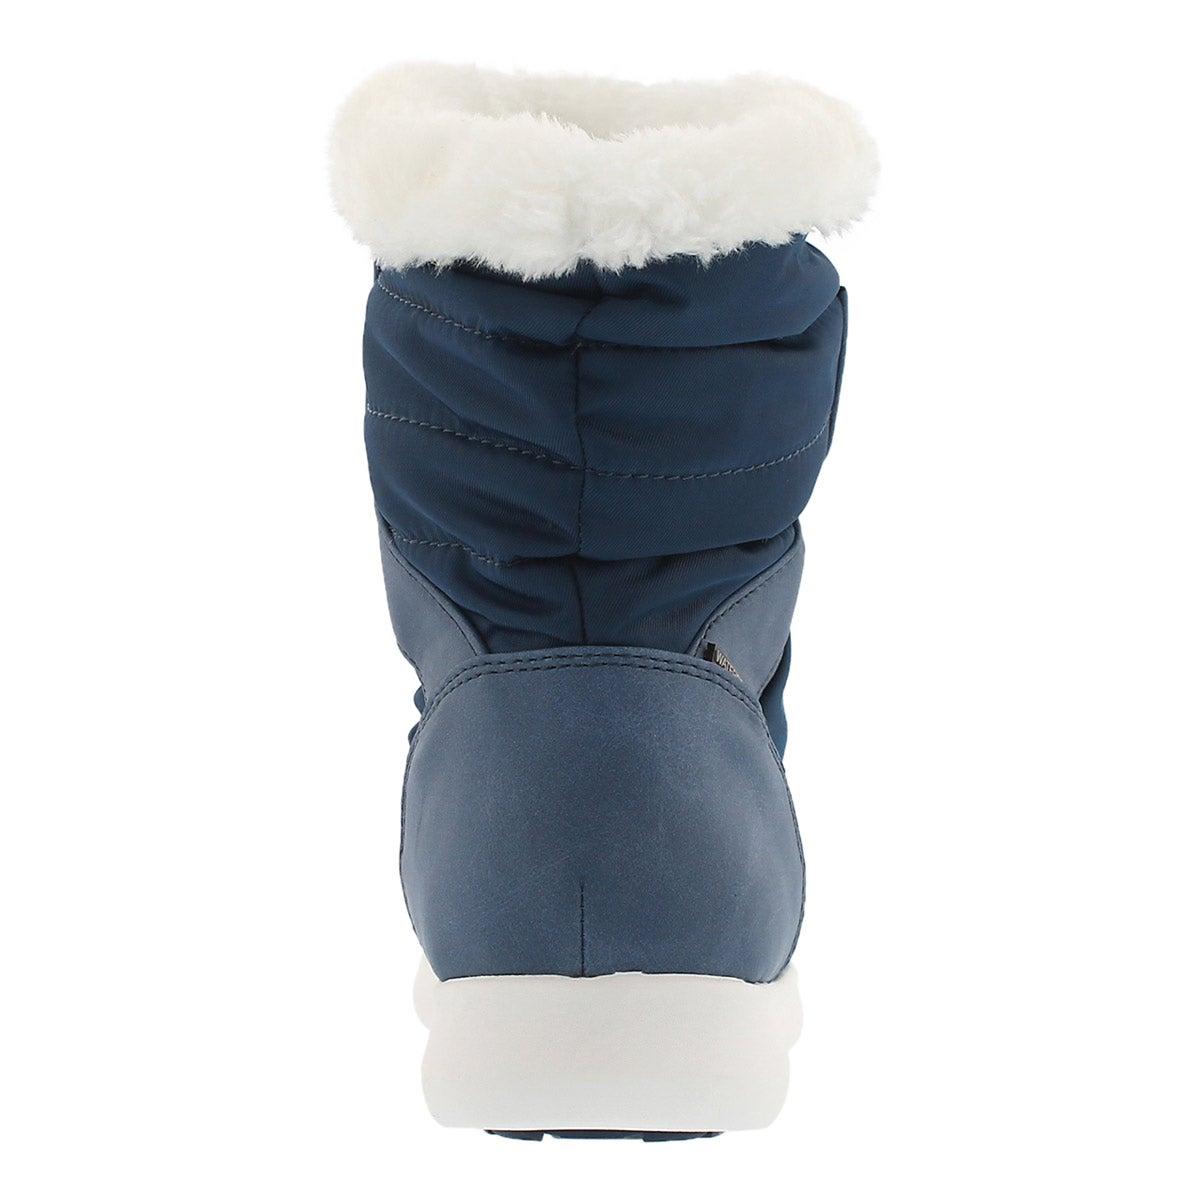 Lds Wonder blue wtpf pull on winter boot